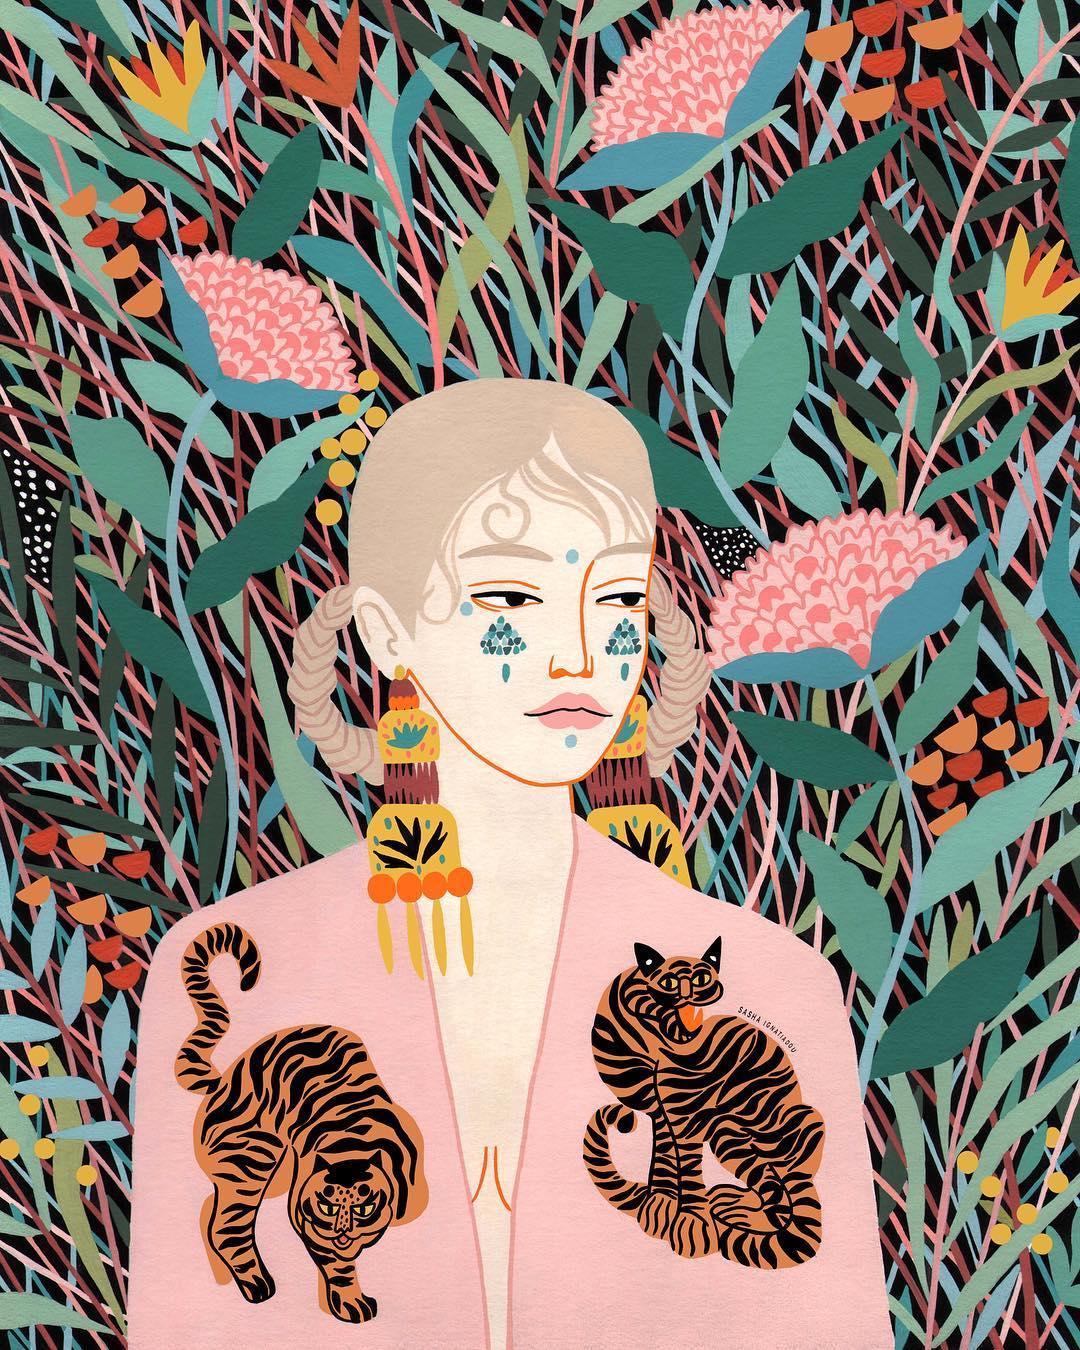 Illustration by Sasha Ignatiadou